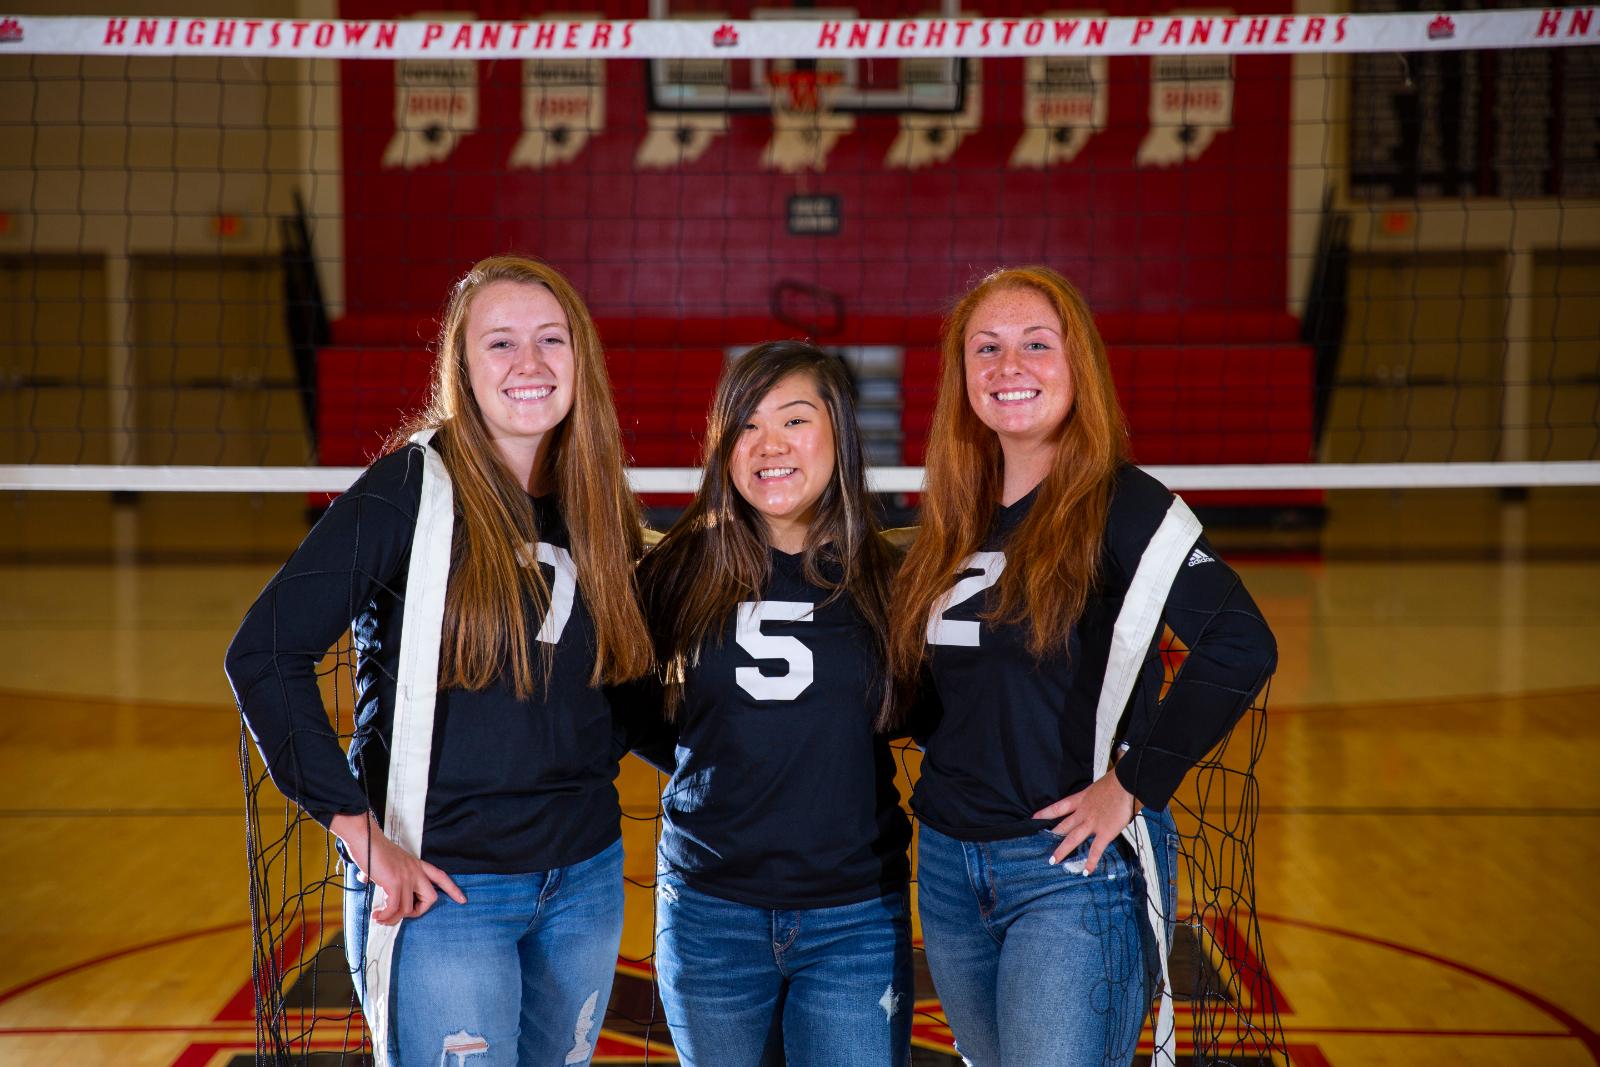 KHS Volleyball Senior Night is AUGUST 31st!!!